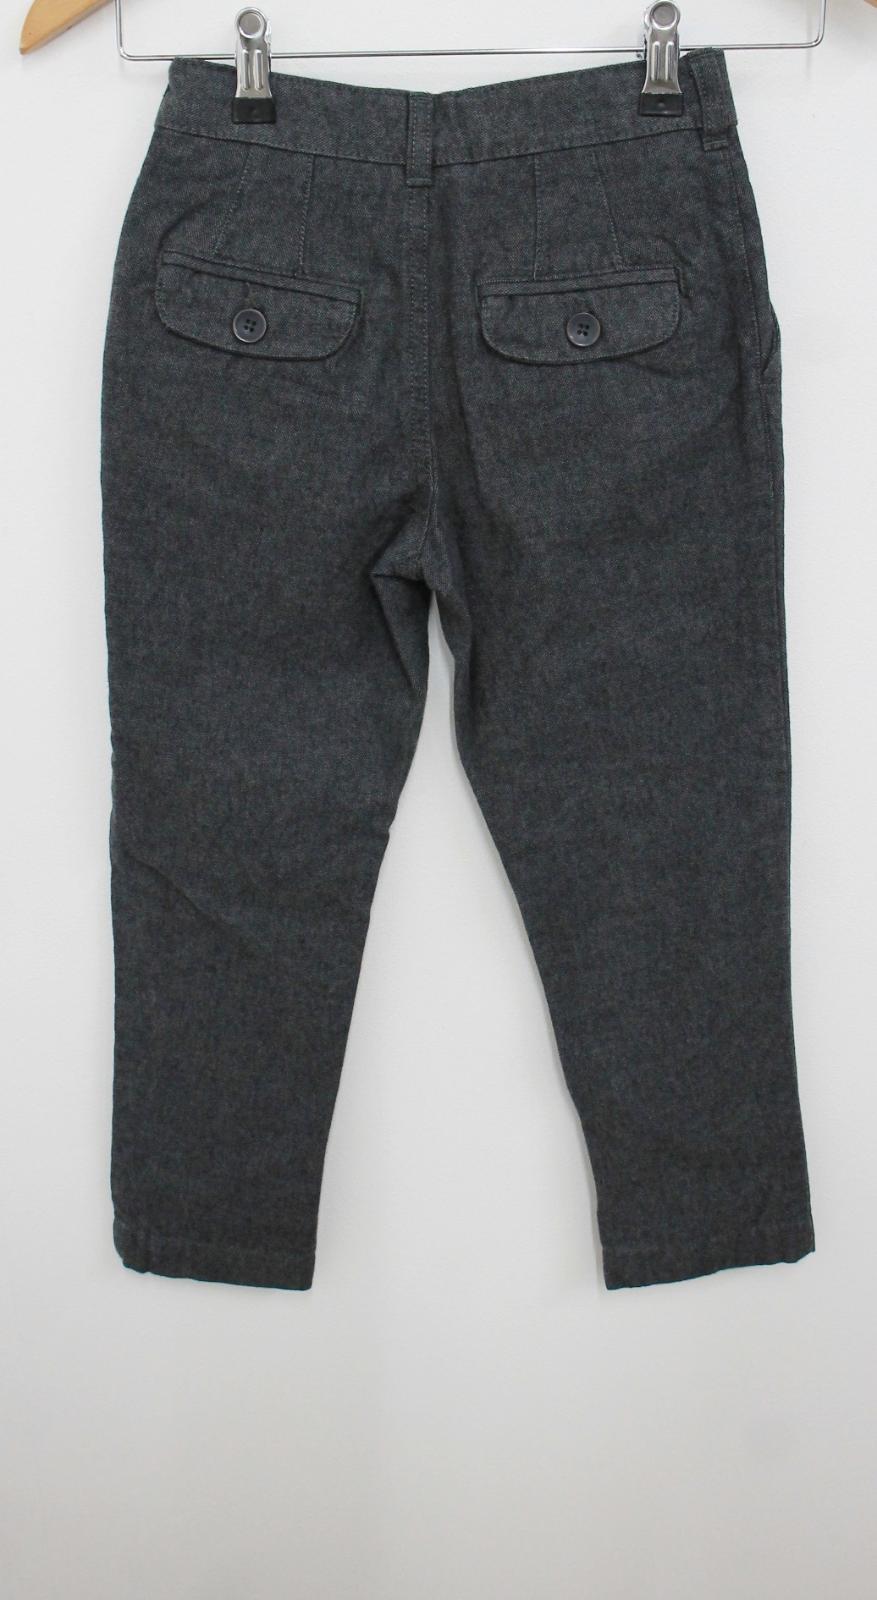 JOHN LEWIS Boy's Dark Grey Elastic Waist Skinny Fit Cotton Trousers 5 Yrs. NEW 3